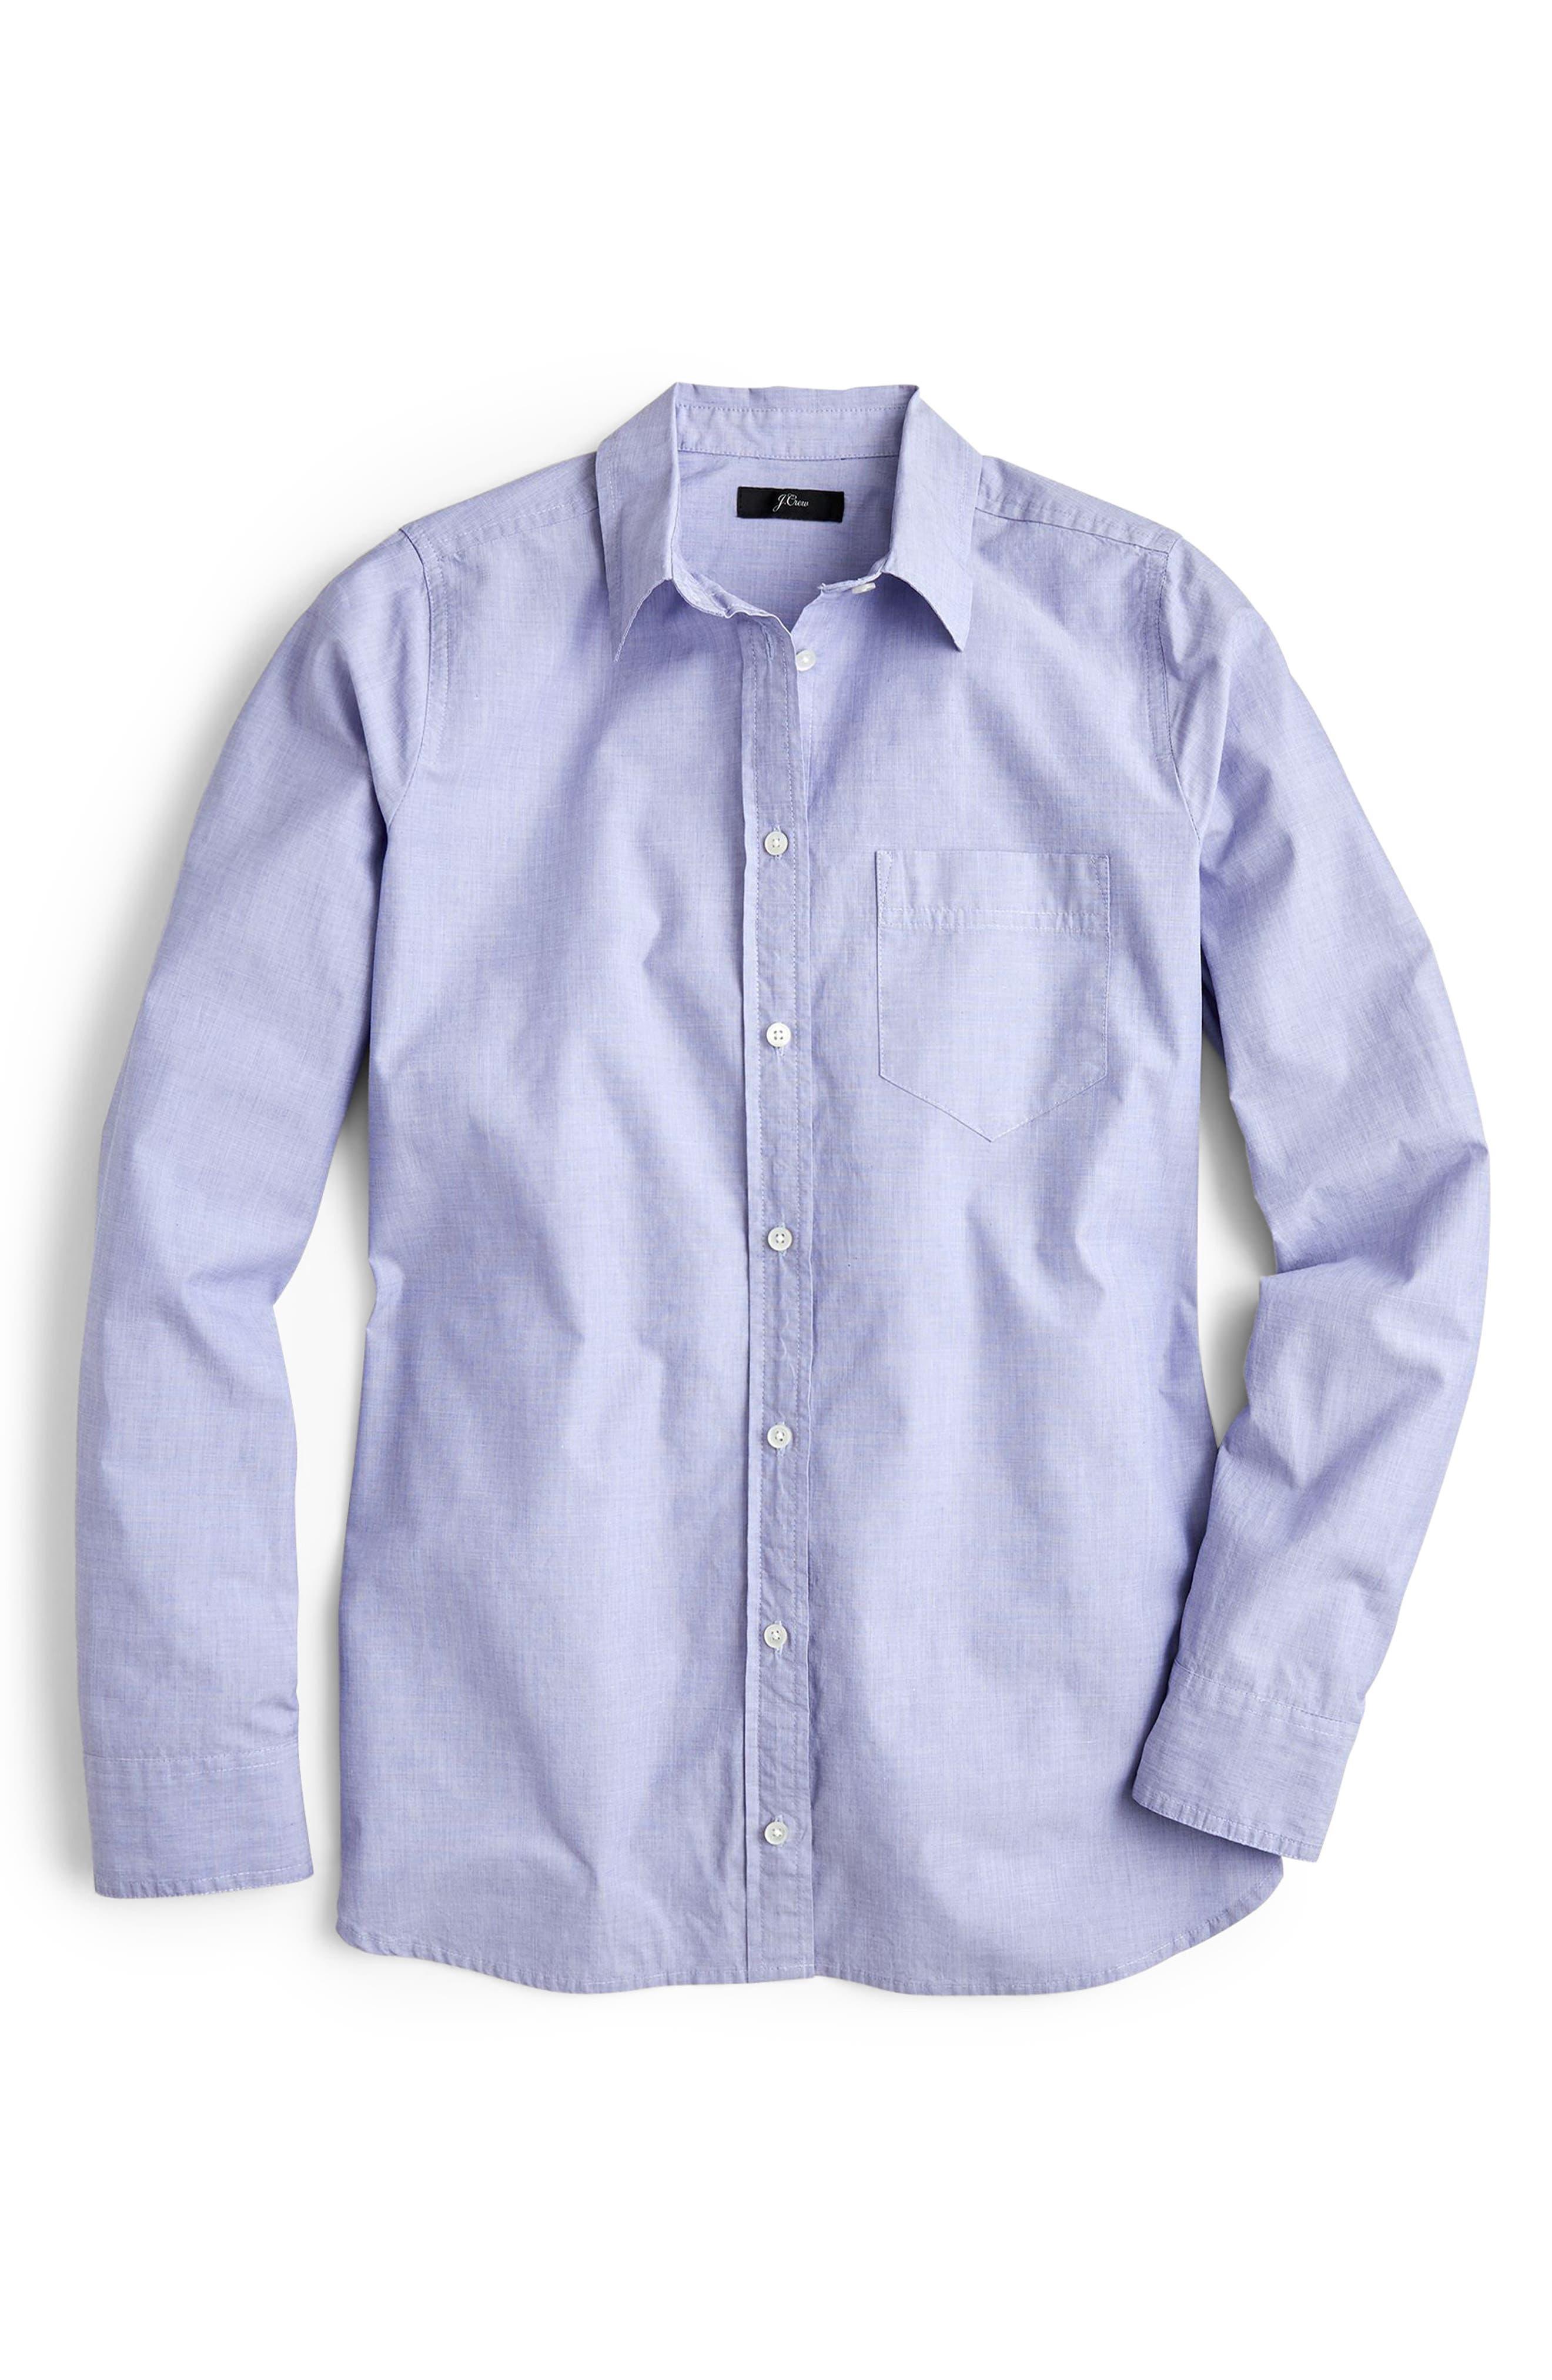 J.CREW,                             End on End Boy Shirt,                             Main thumbnail 1, color,                             PERI